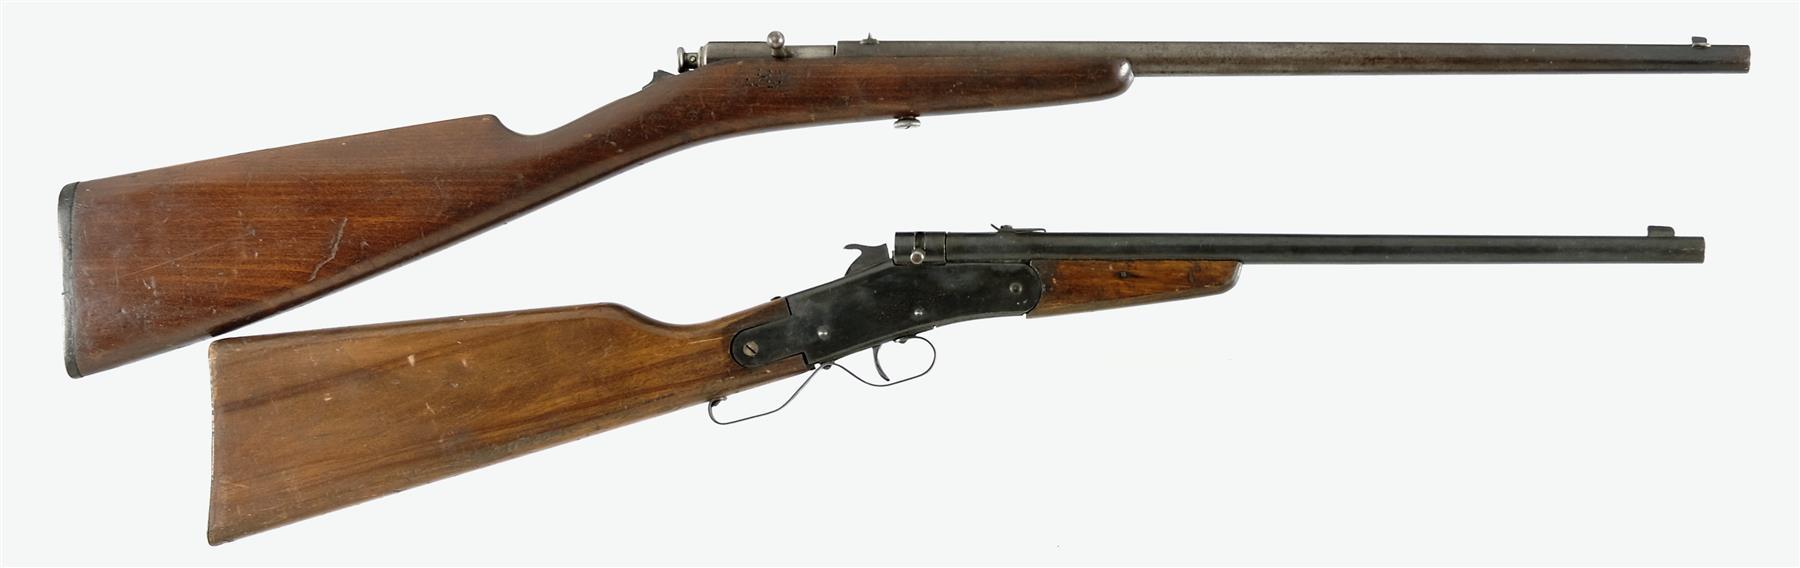 Thumb trigger rifle